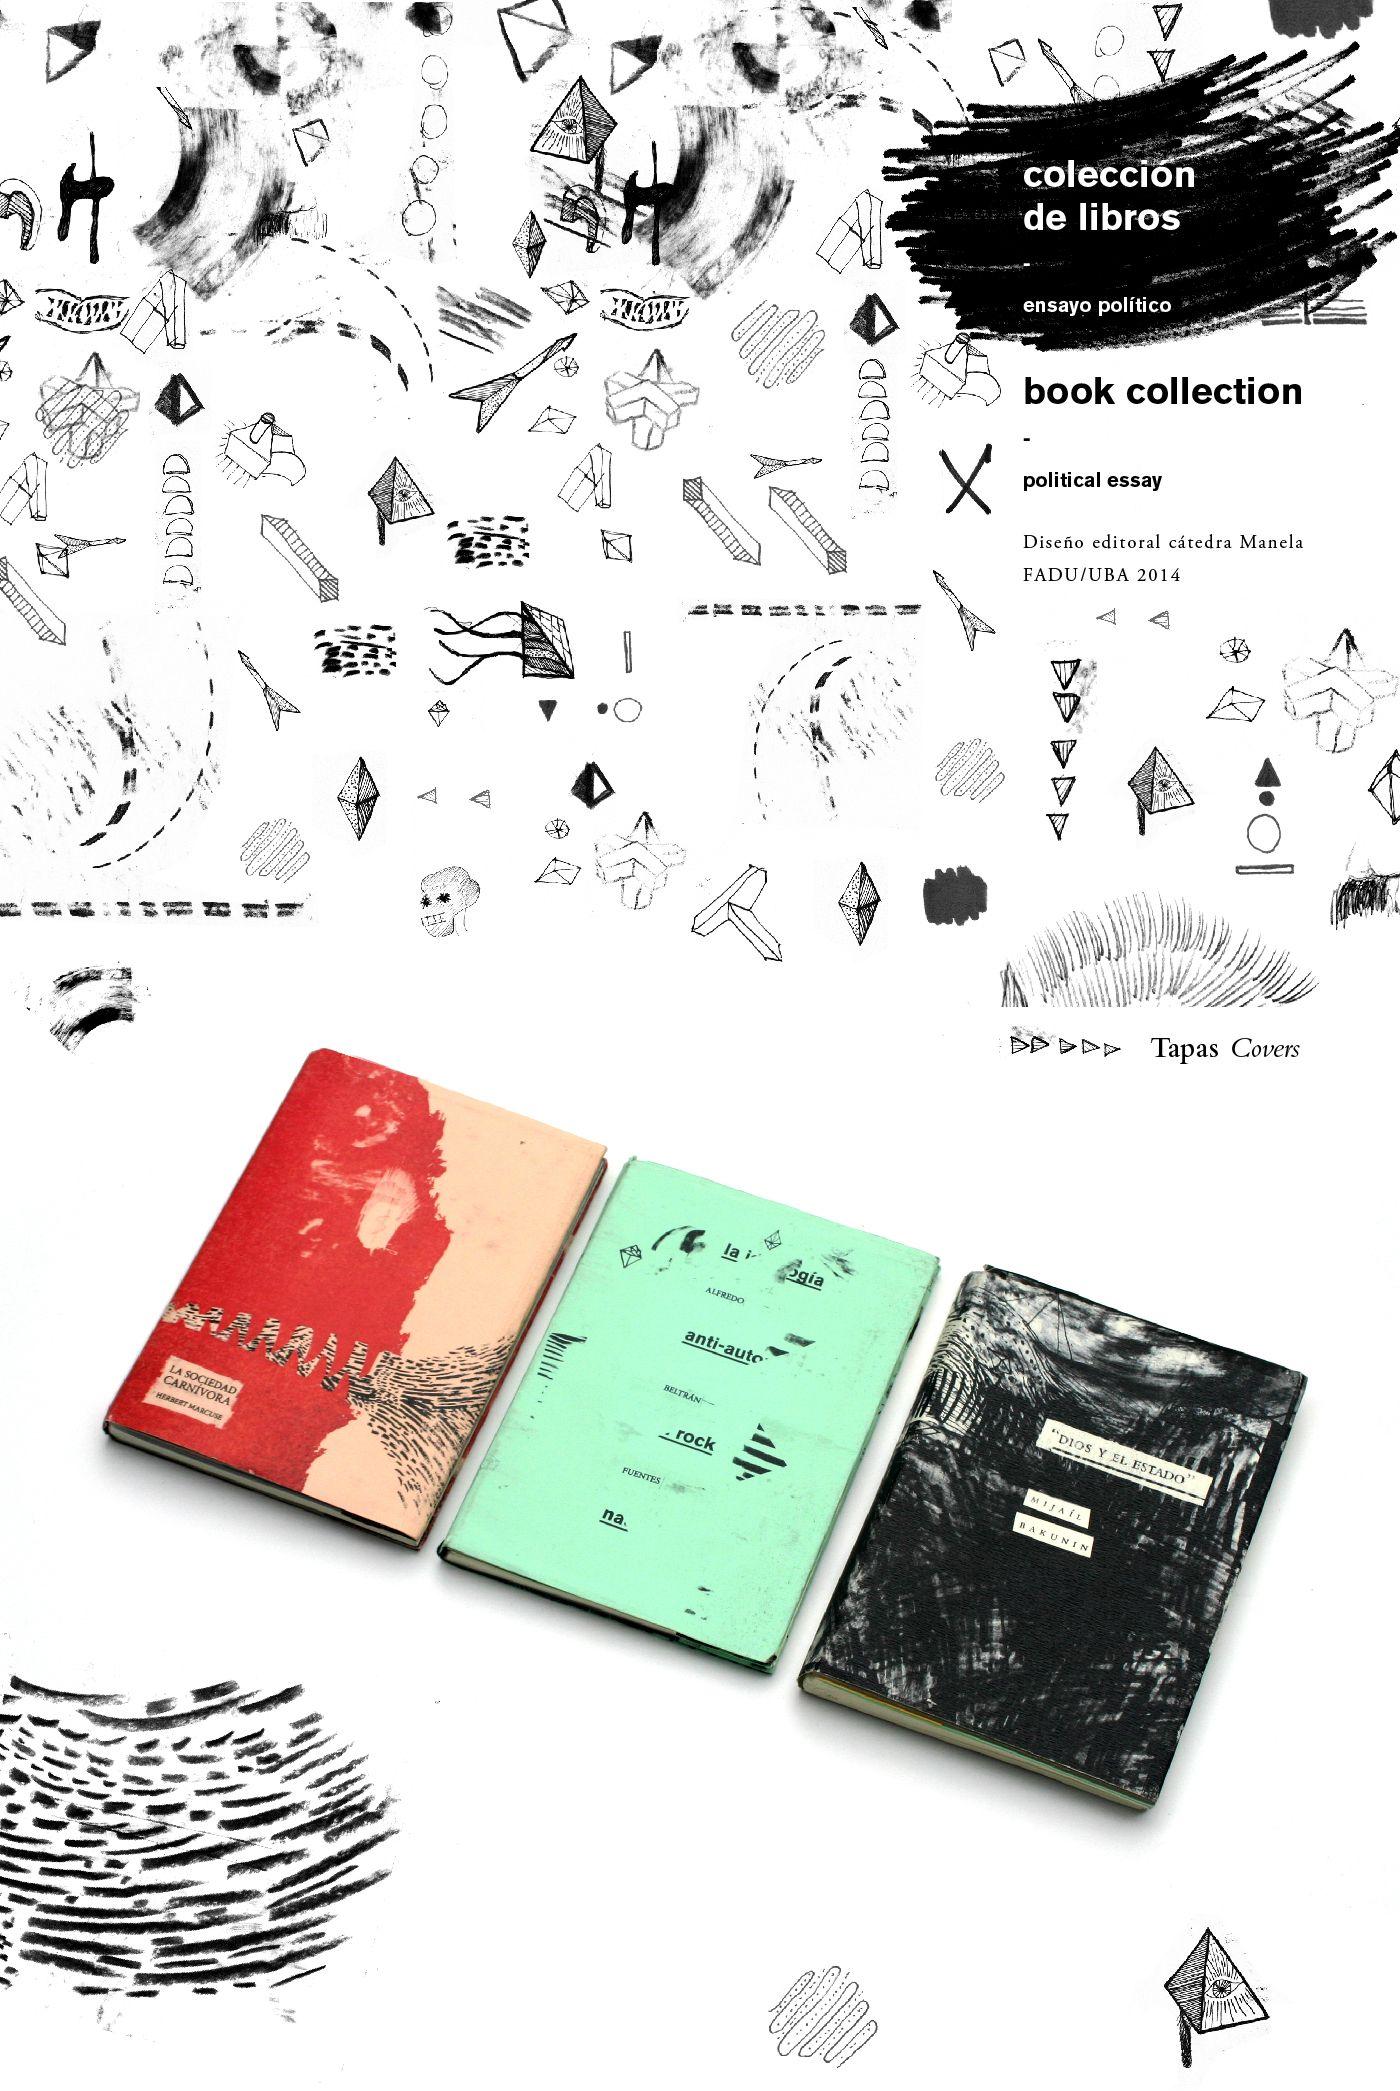 Book collection of political essay.Editorial Manela, FADU 2014